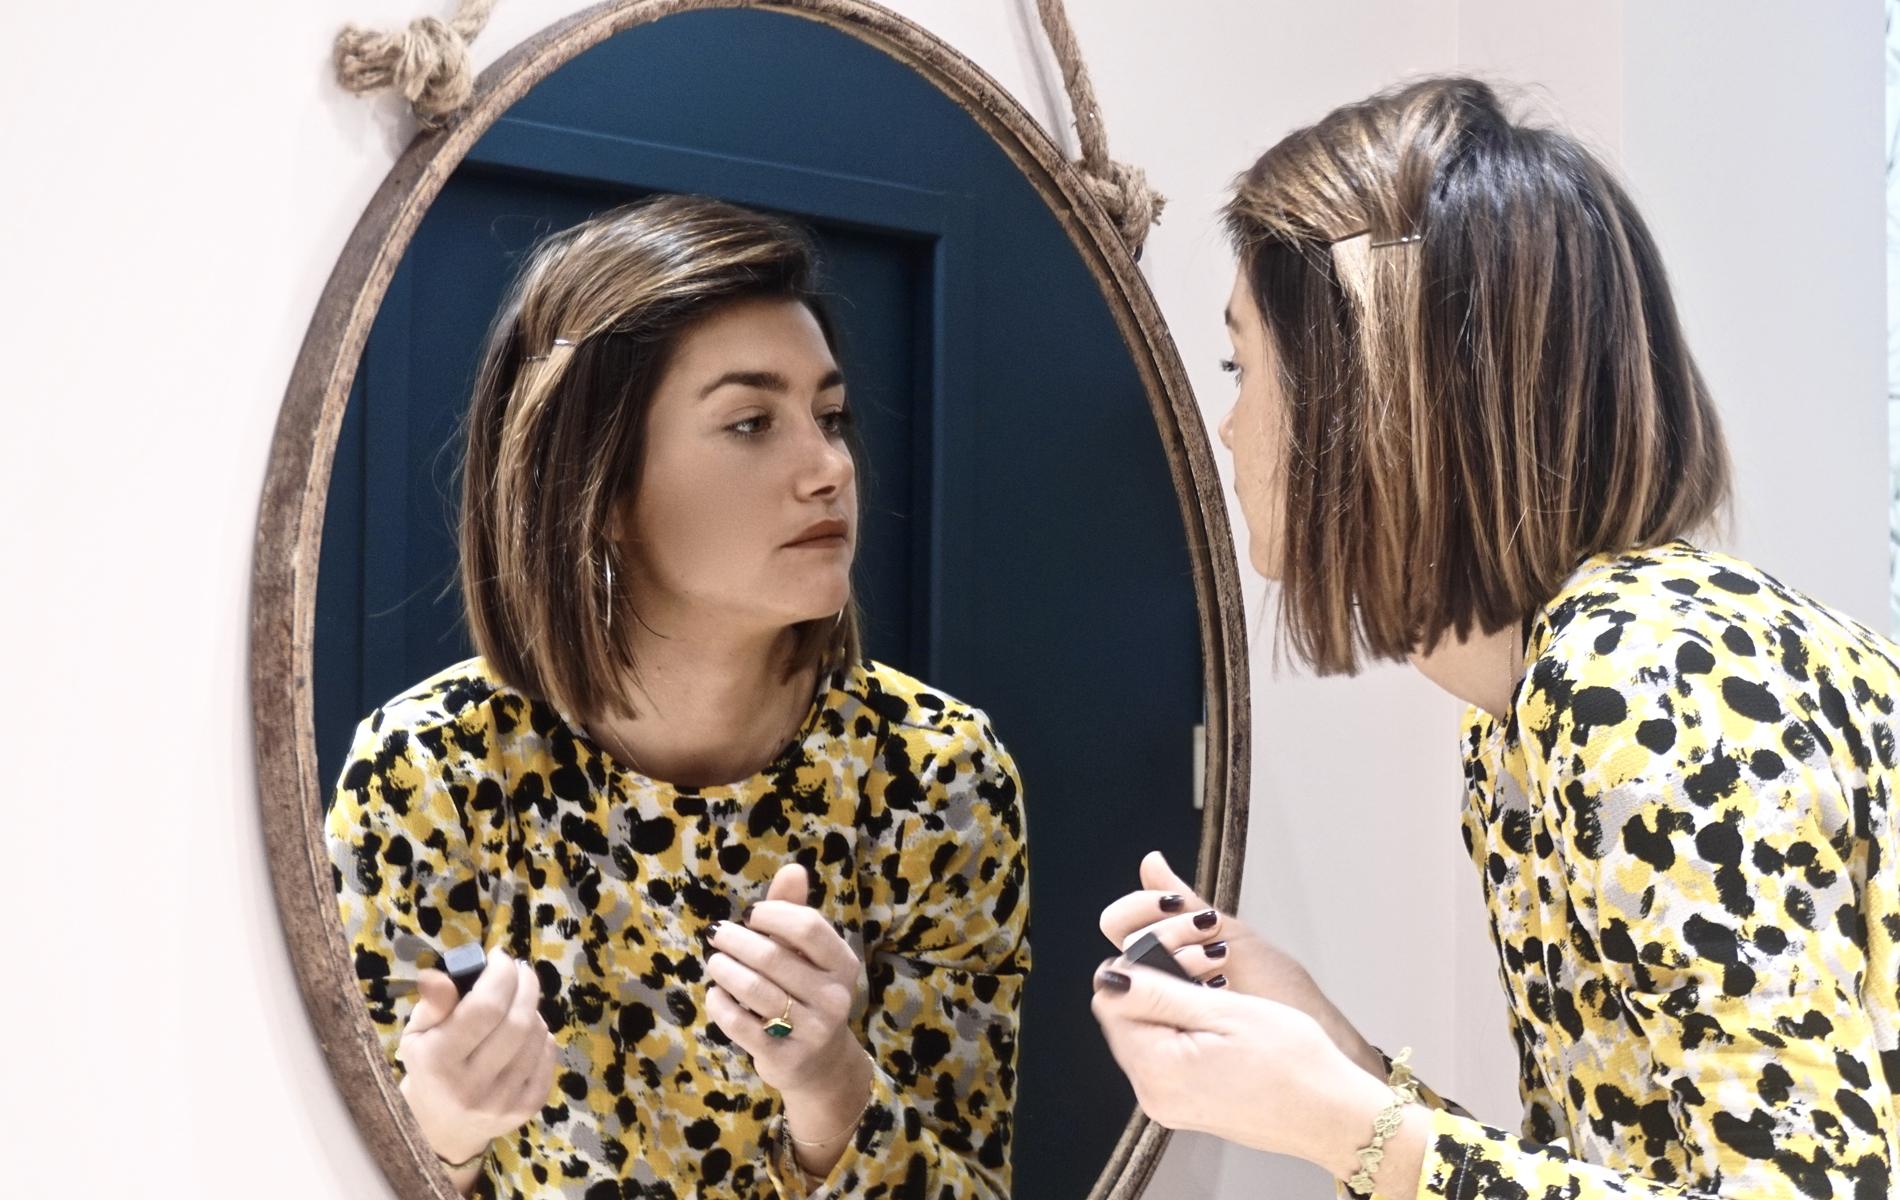 salon-de-coiffure-olazabal-7